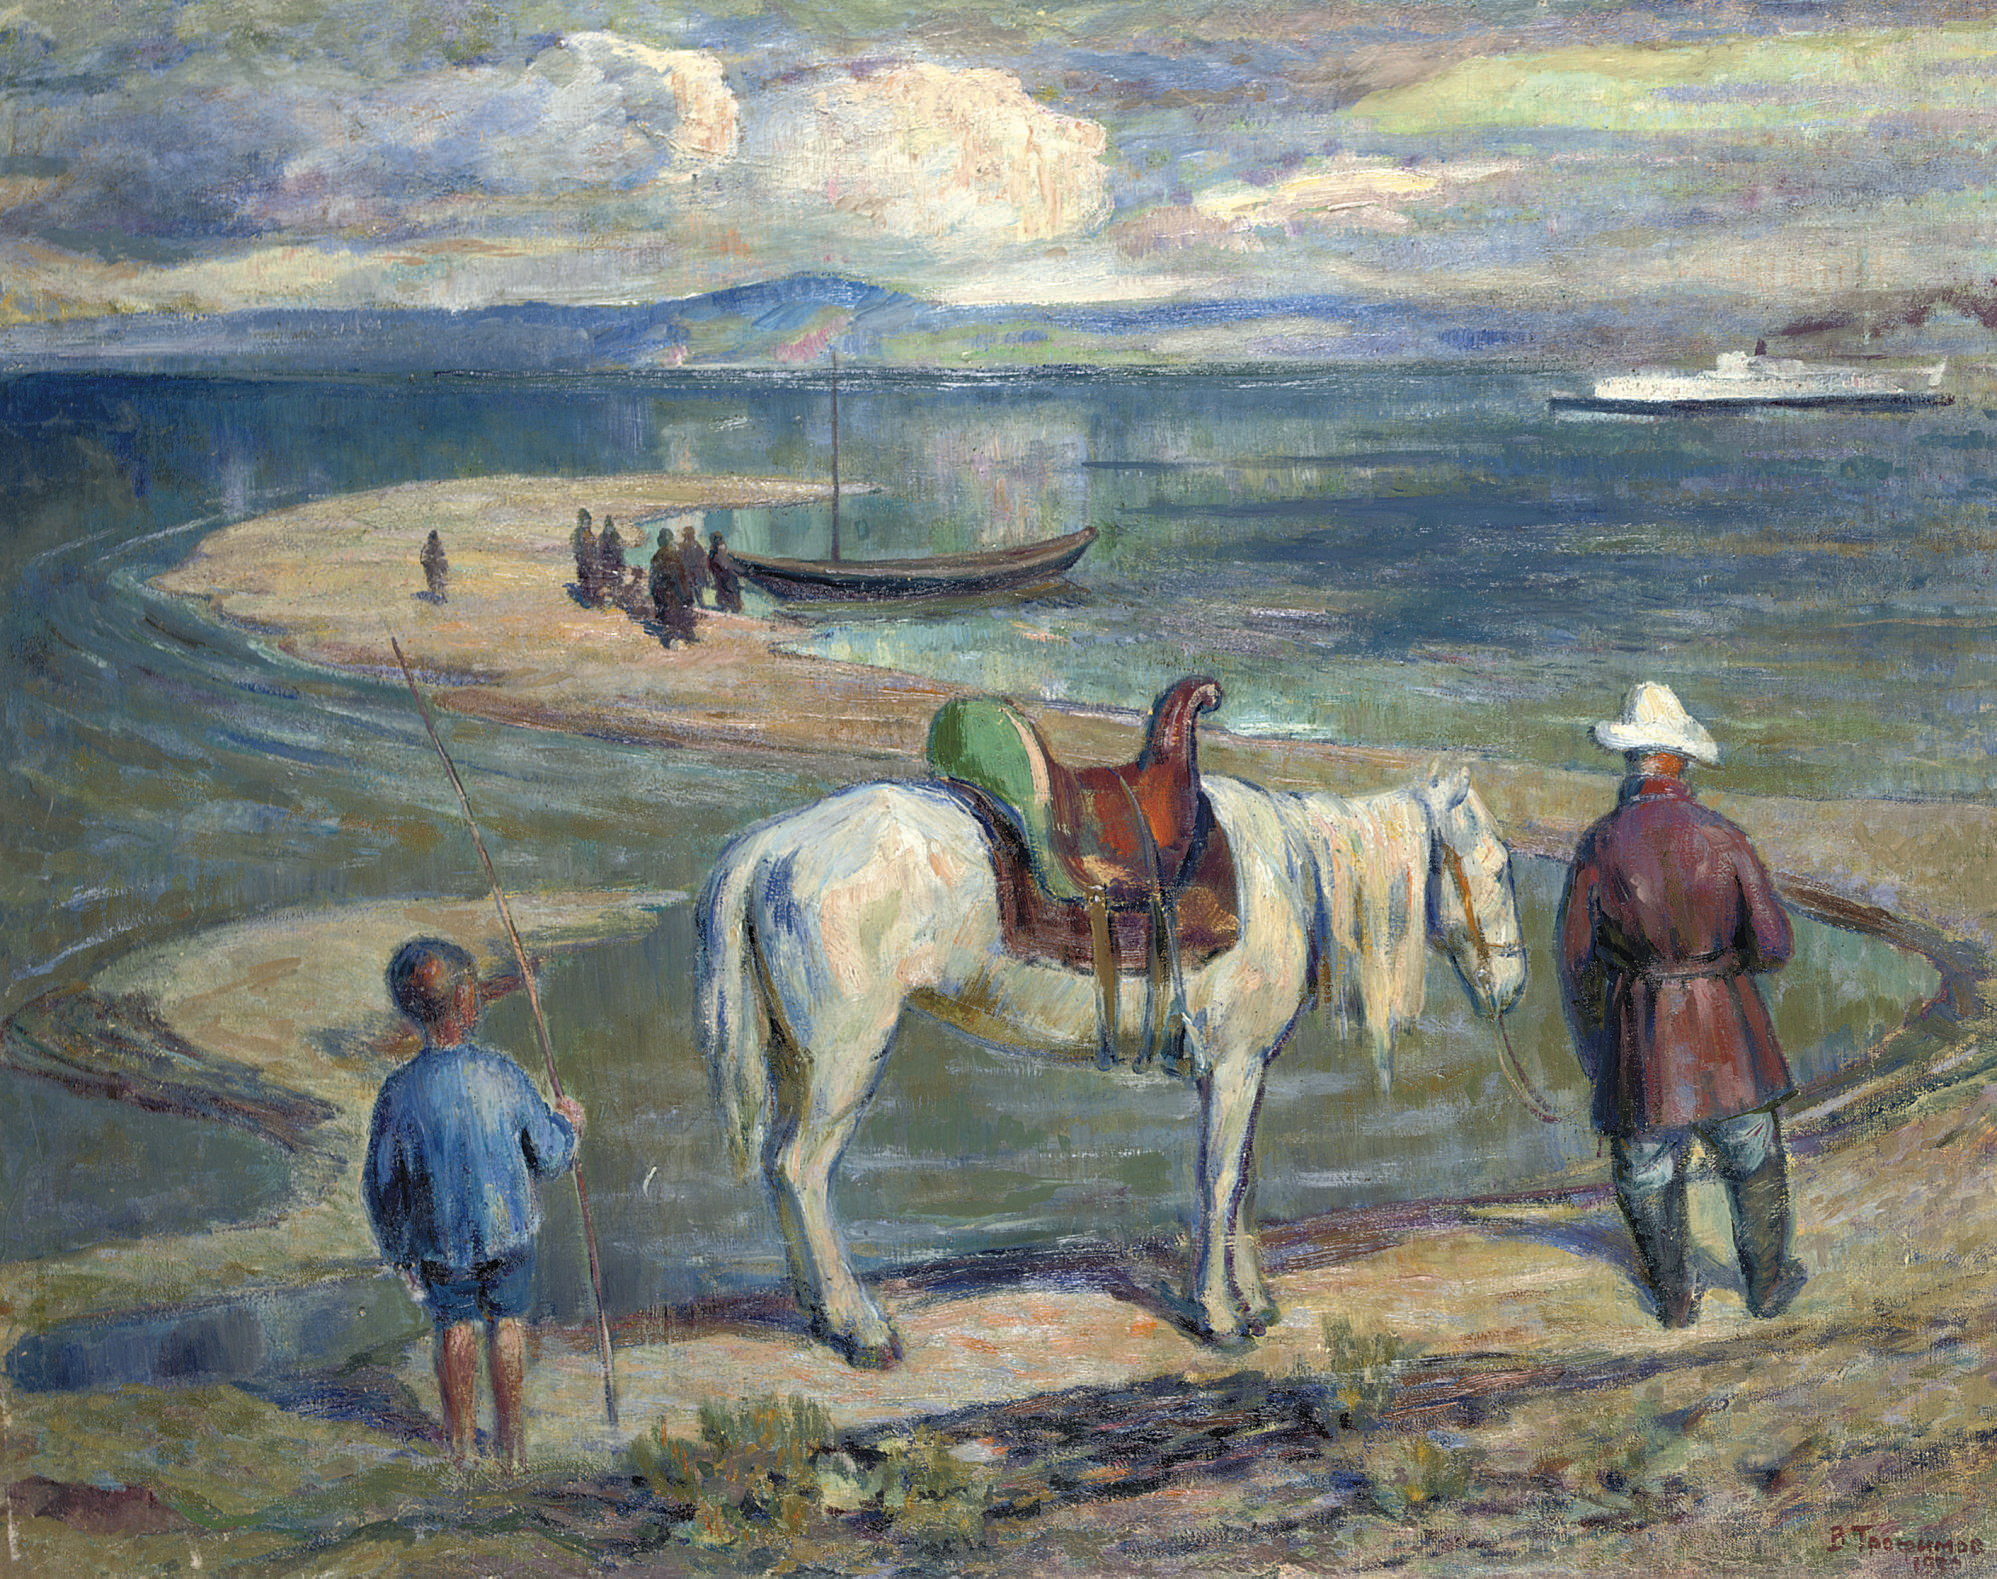 Vikentii Trofimov (1878-1956)